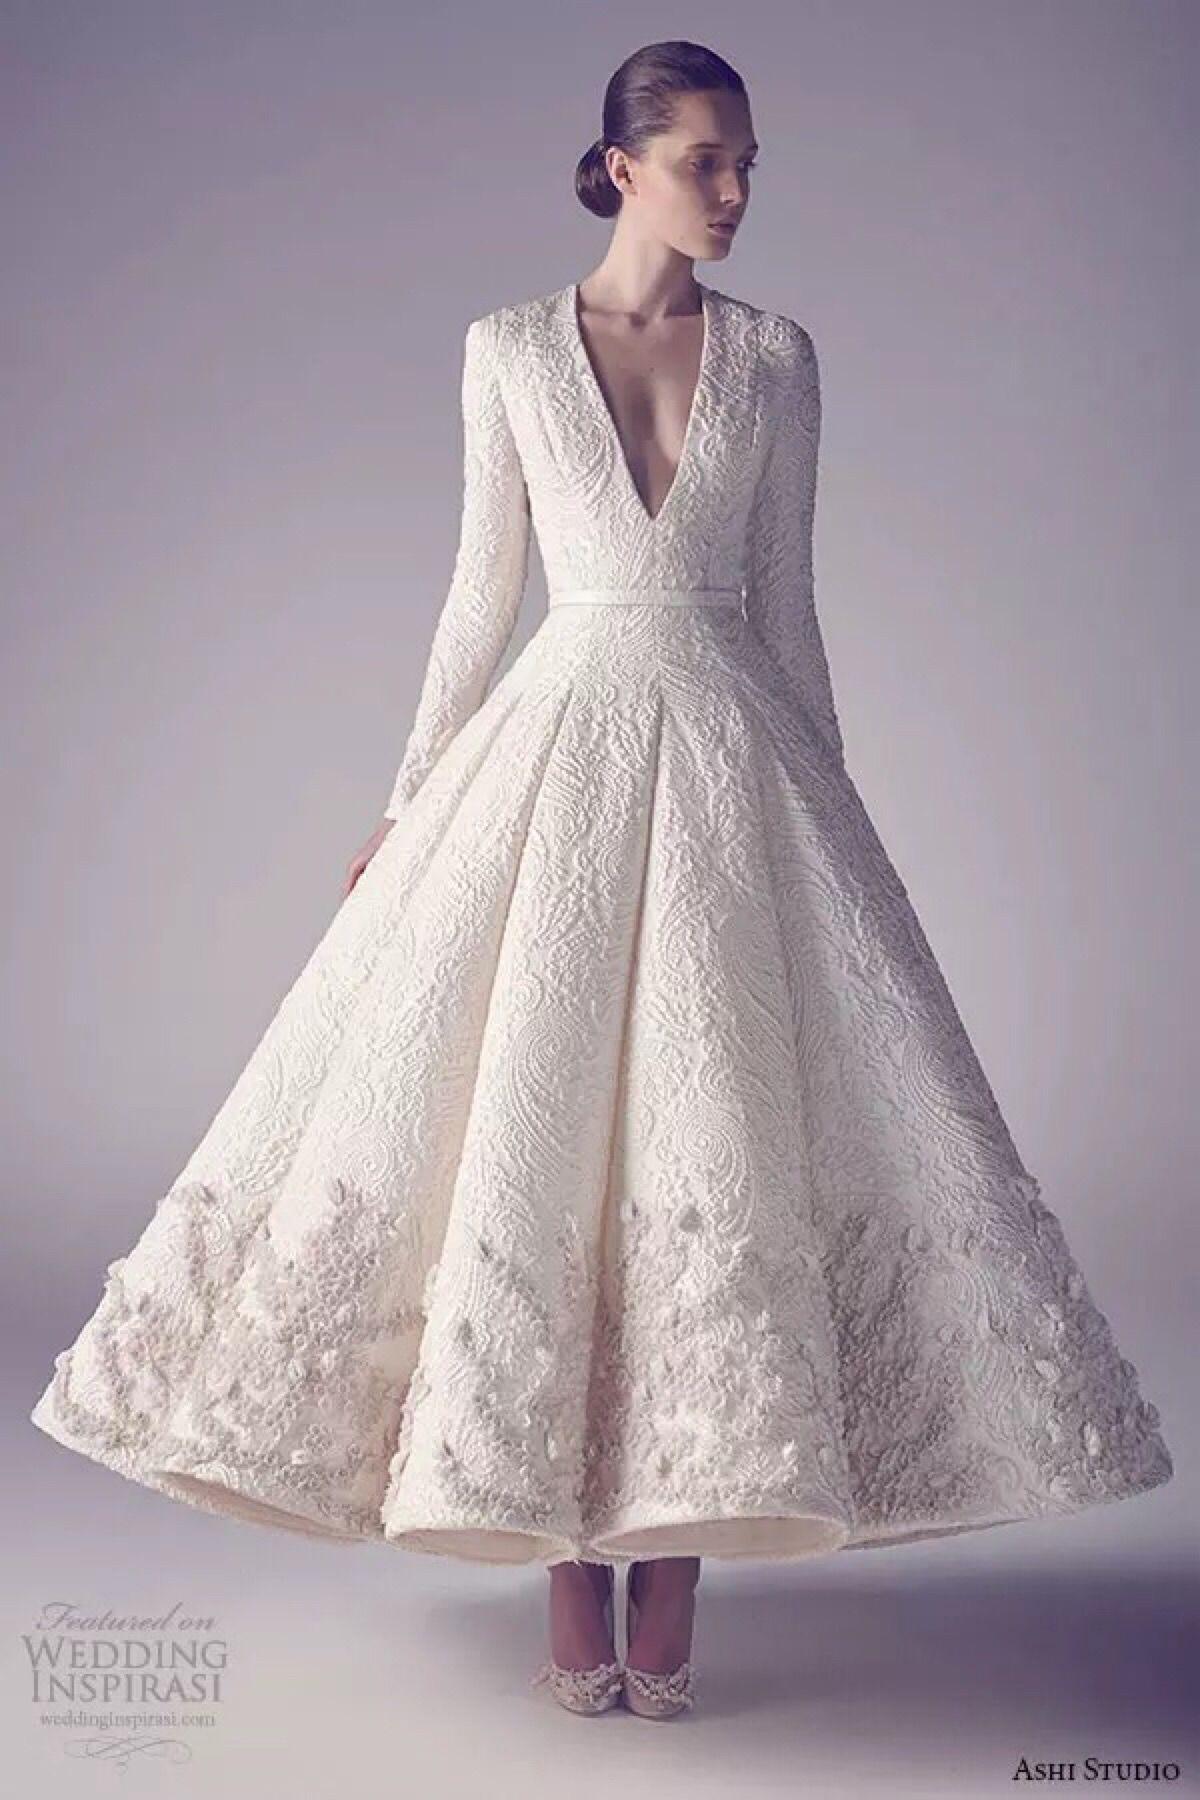 Pin by Cynthia Liu on Wedding Dress | Pinterest | Midi dresses and ...